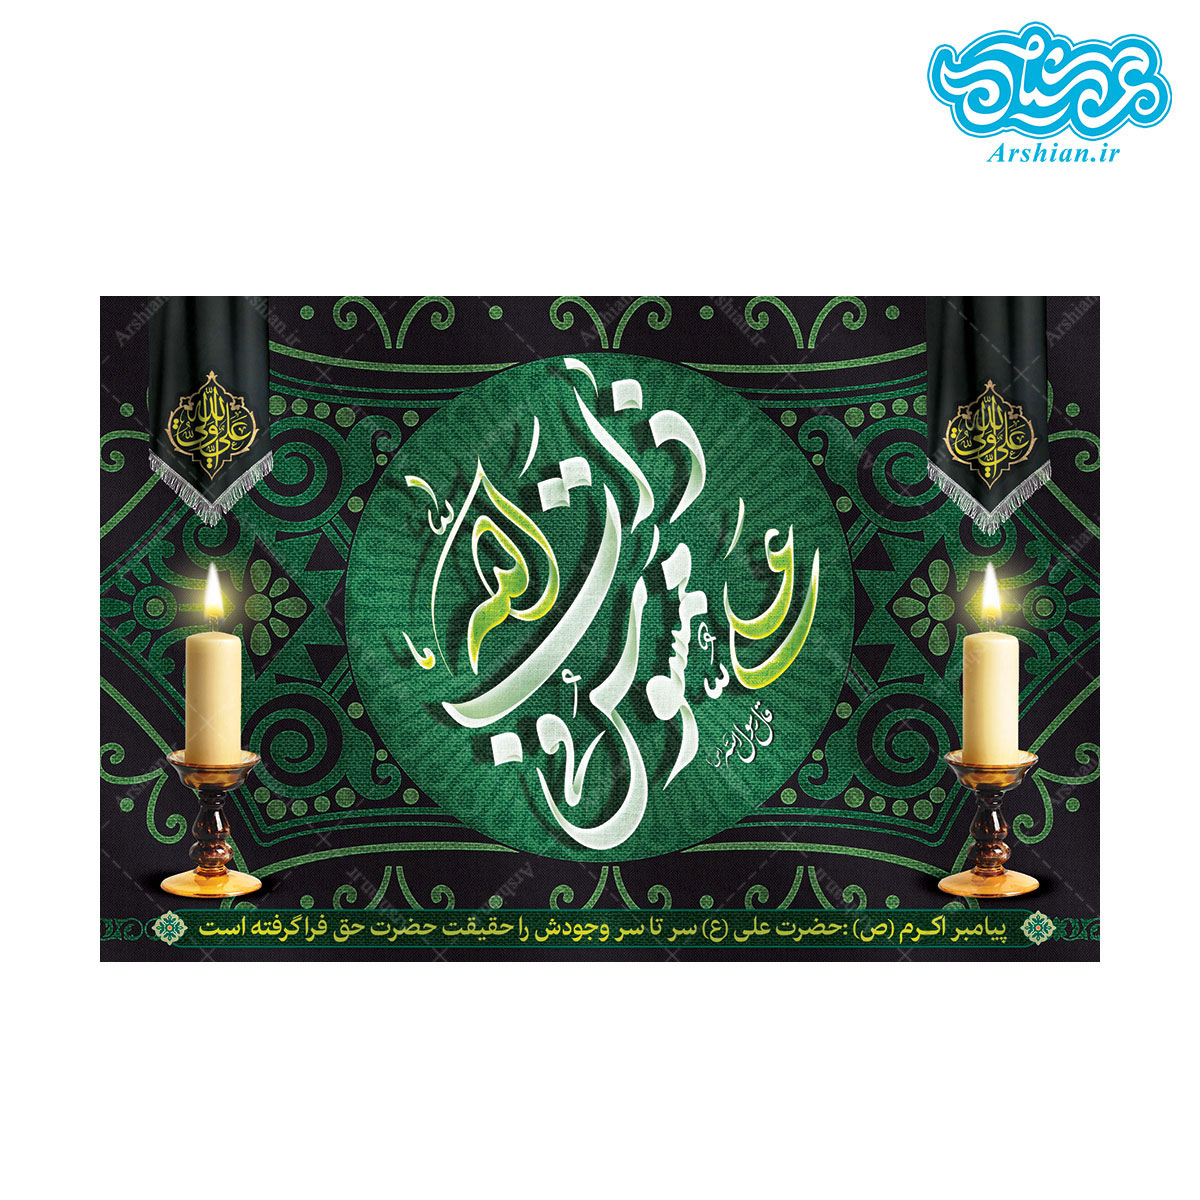 قاب شاسی باطرح علی ممسوس فی ذات الله کد0145